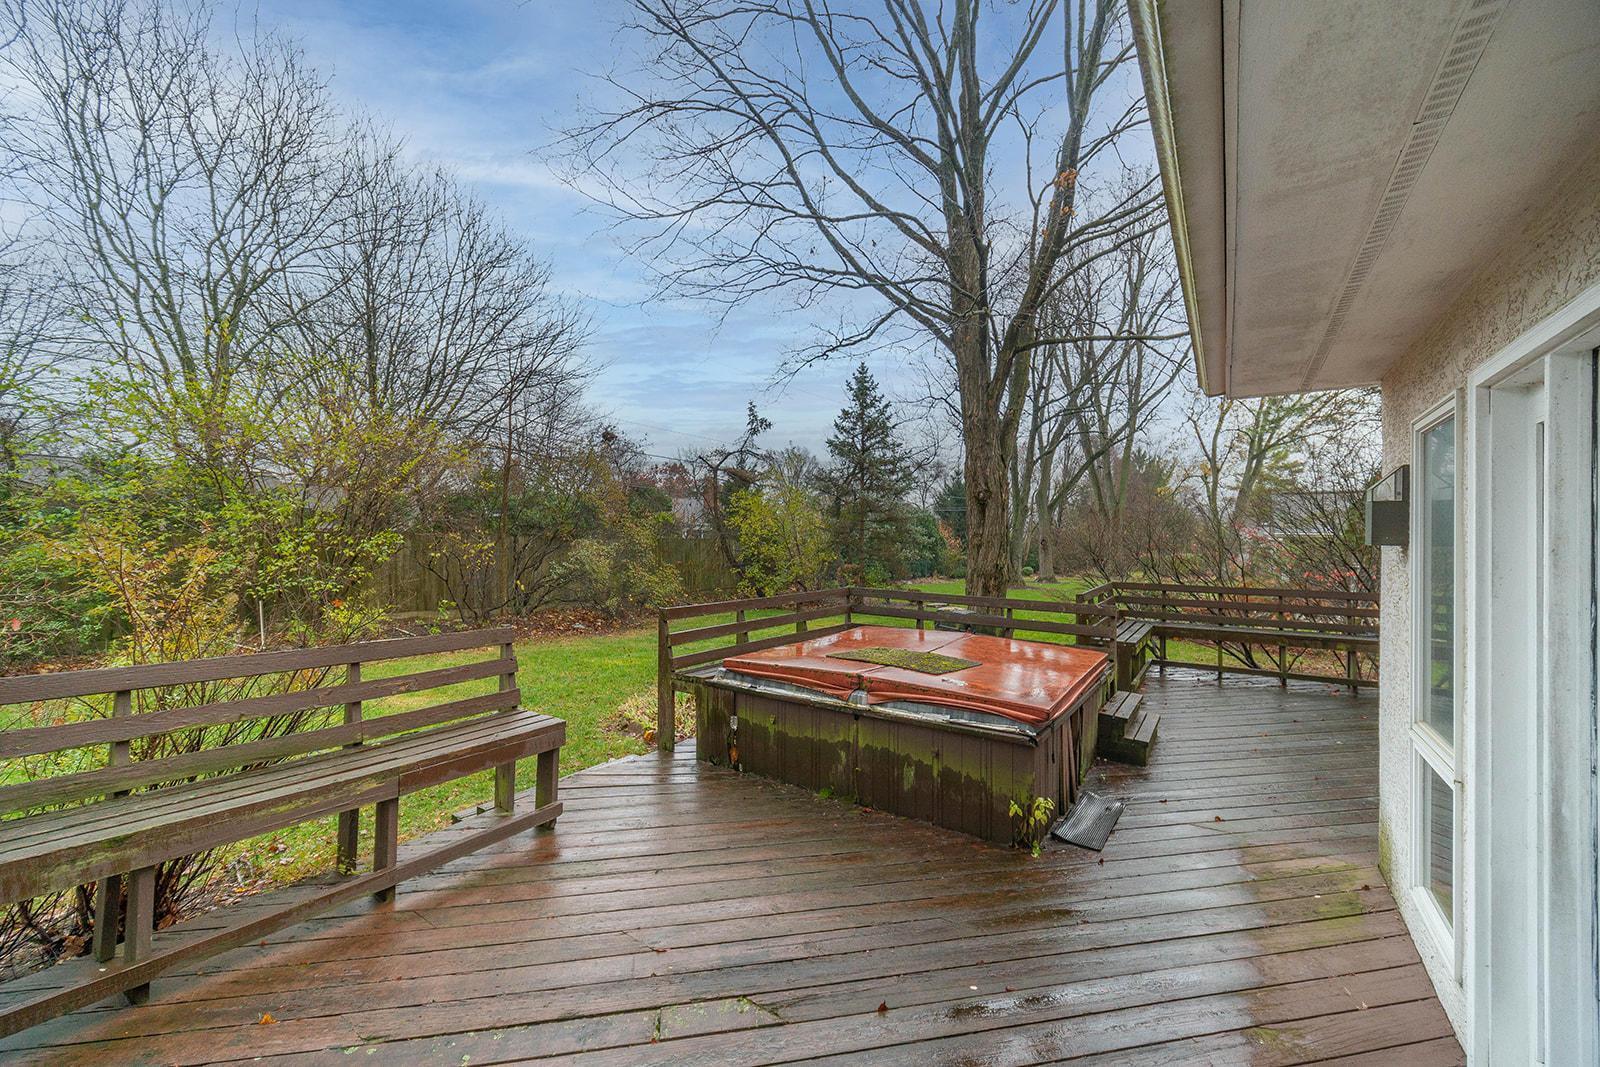 4336 Braunton Road, Columbus, Ohio 43220, 4 Bedrooms Bedrooms, ,3 BathroomsBathrooms,Residential,For Sale,Braunton,220041147